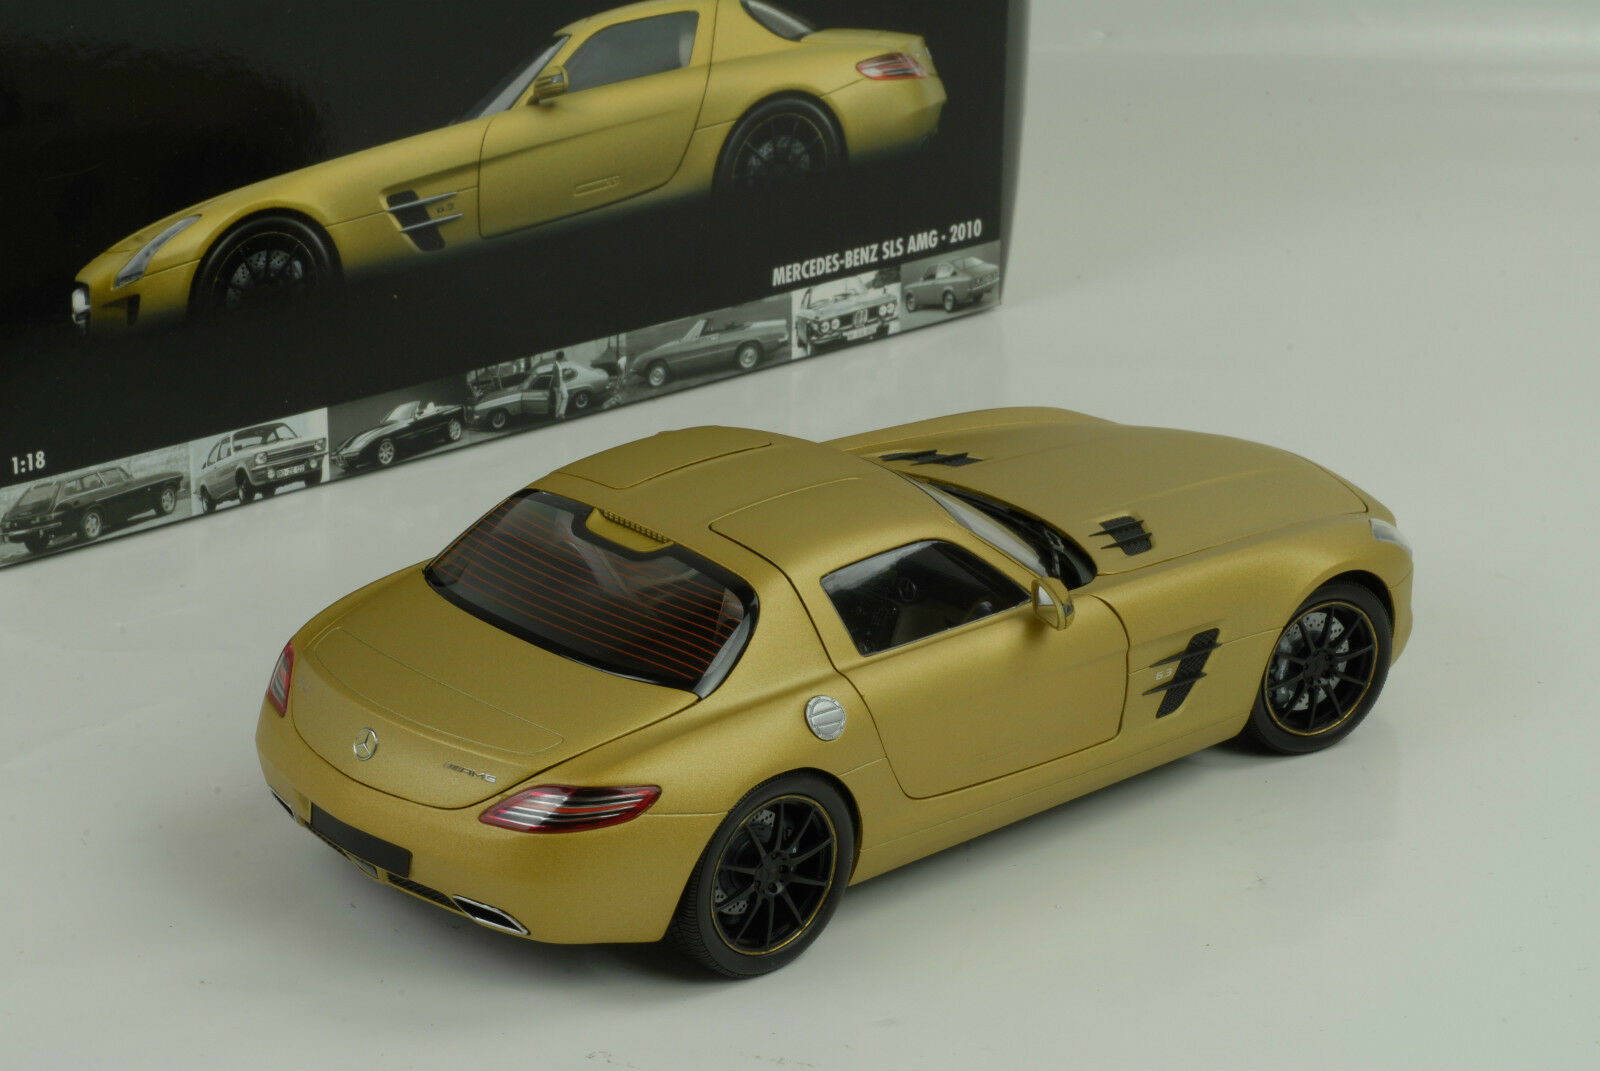 Mercedes - benz sls amg r197 2010 flachem Gold 1,18 minichamps